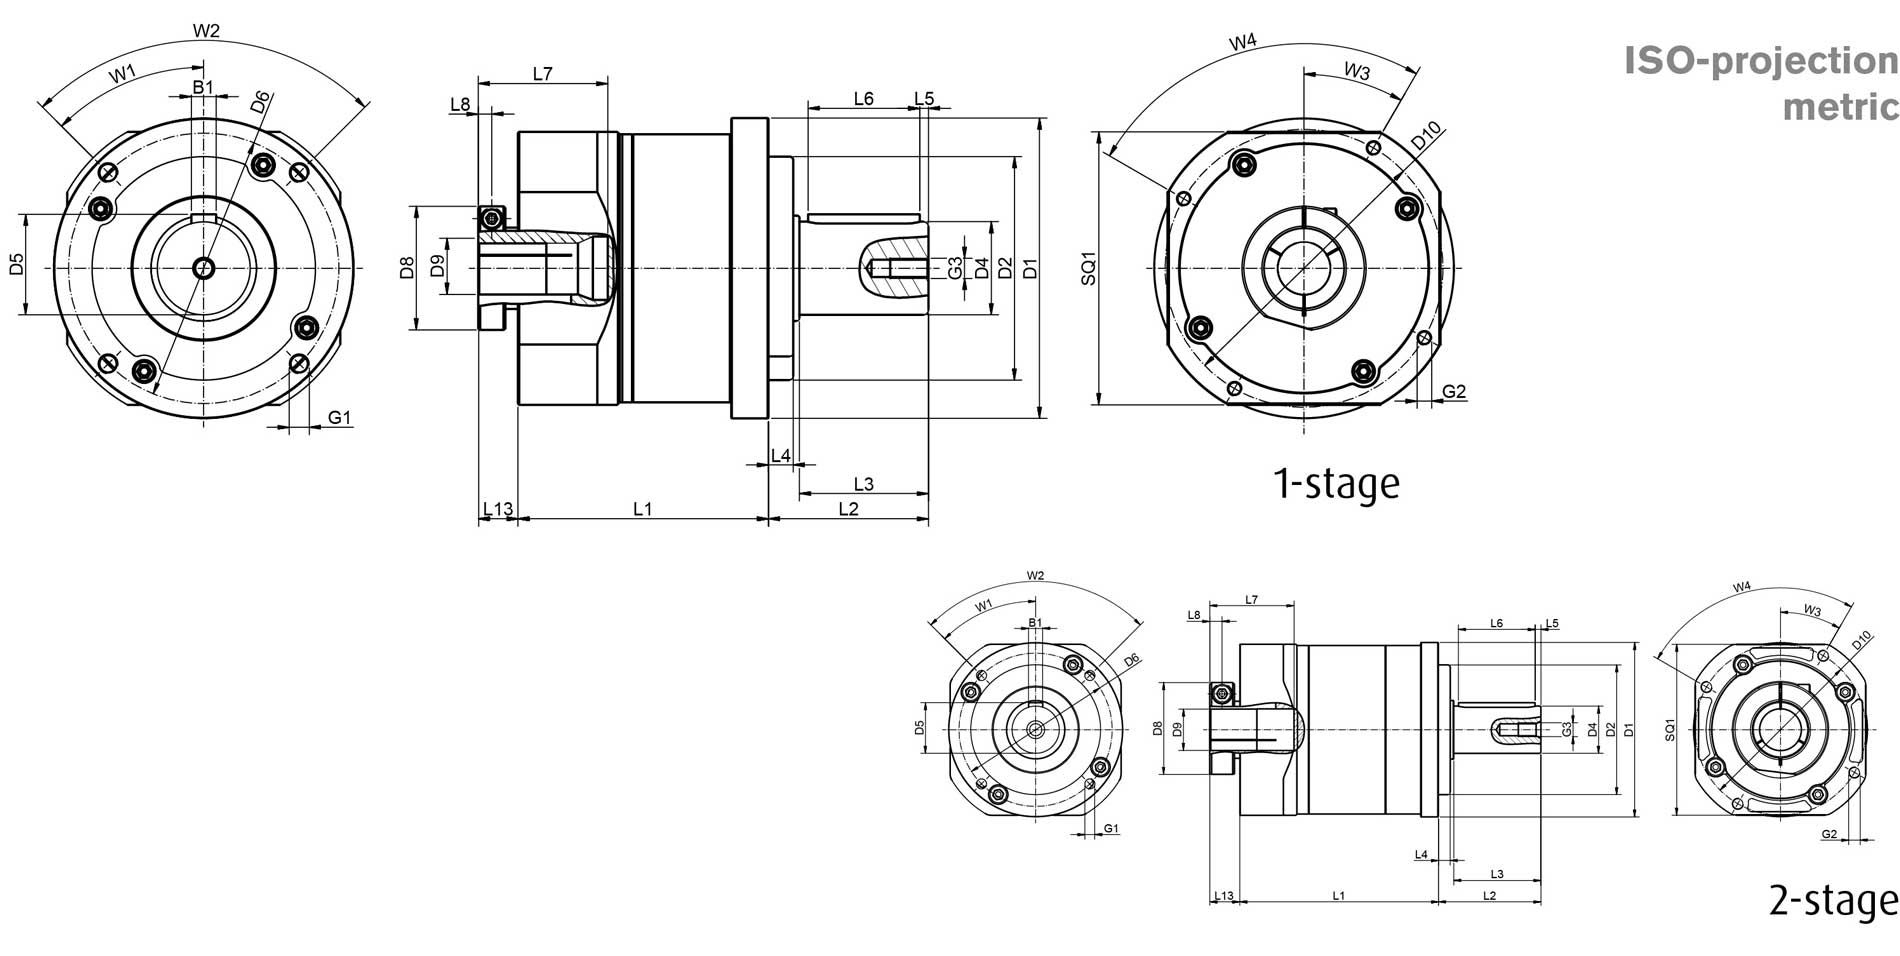 Planetary gear GFE dimensions